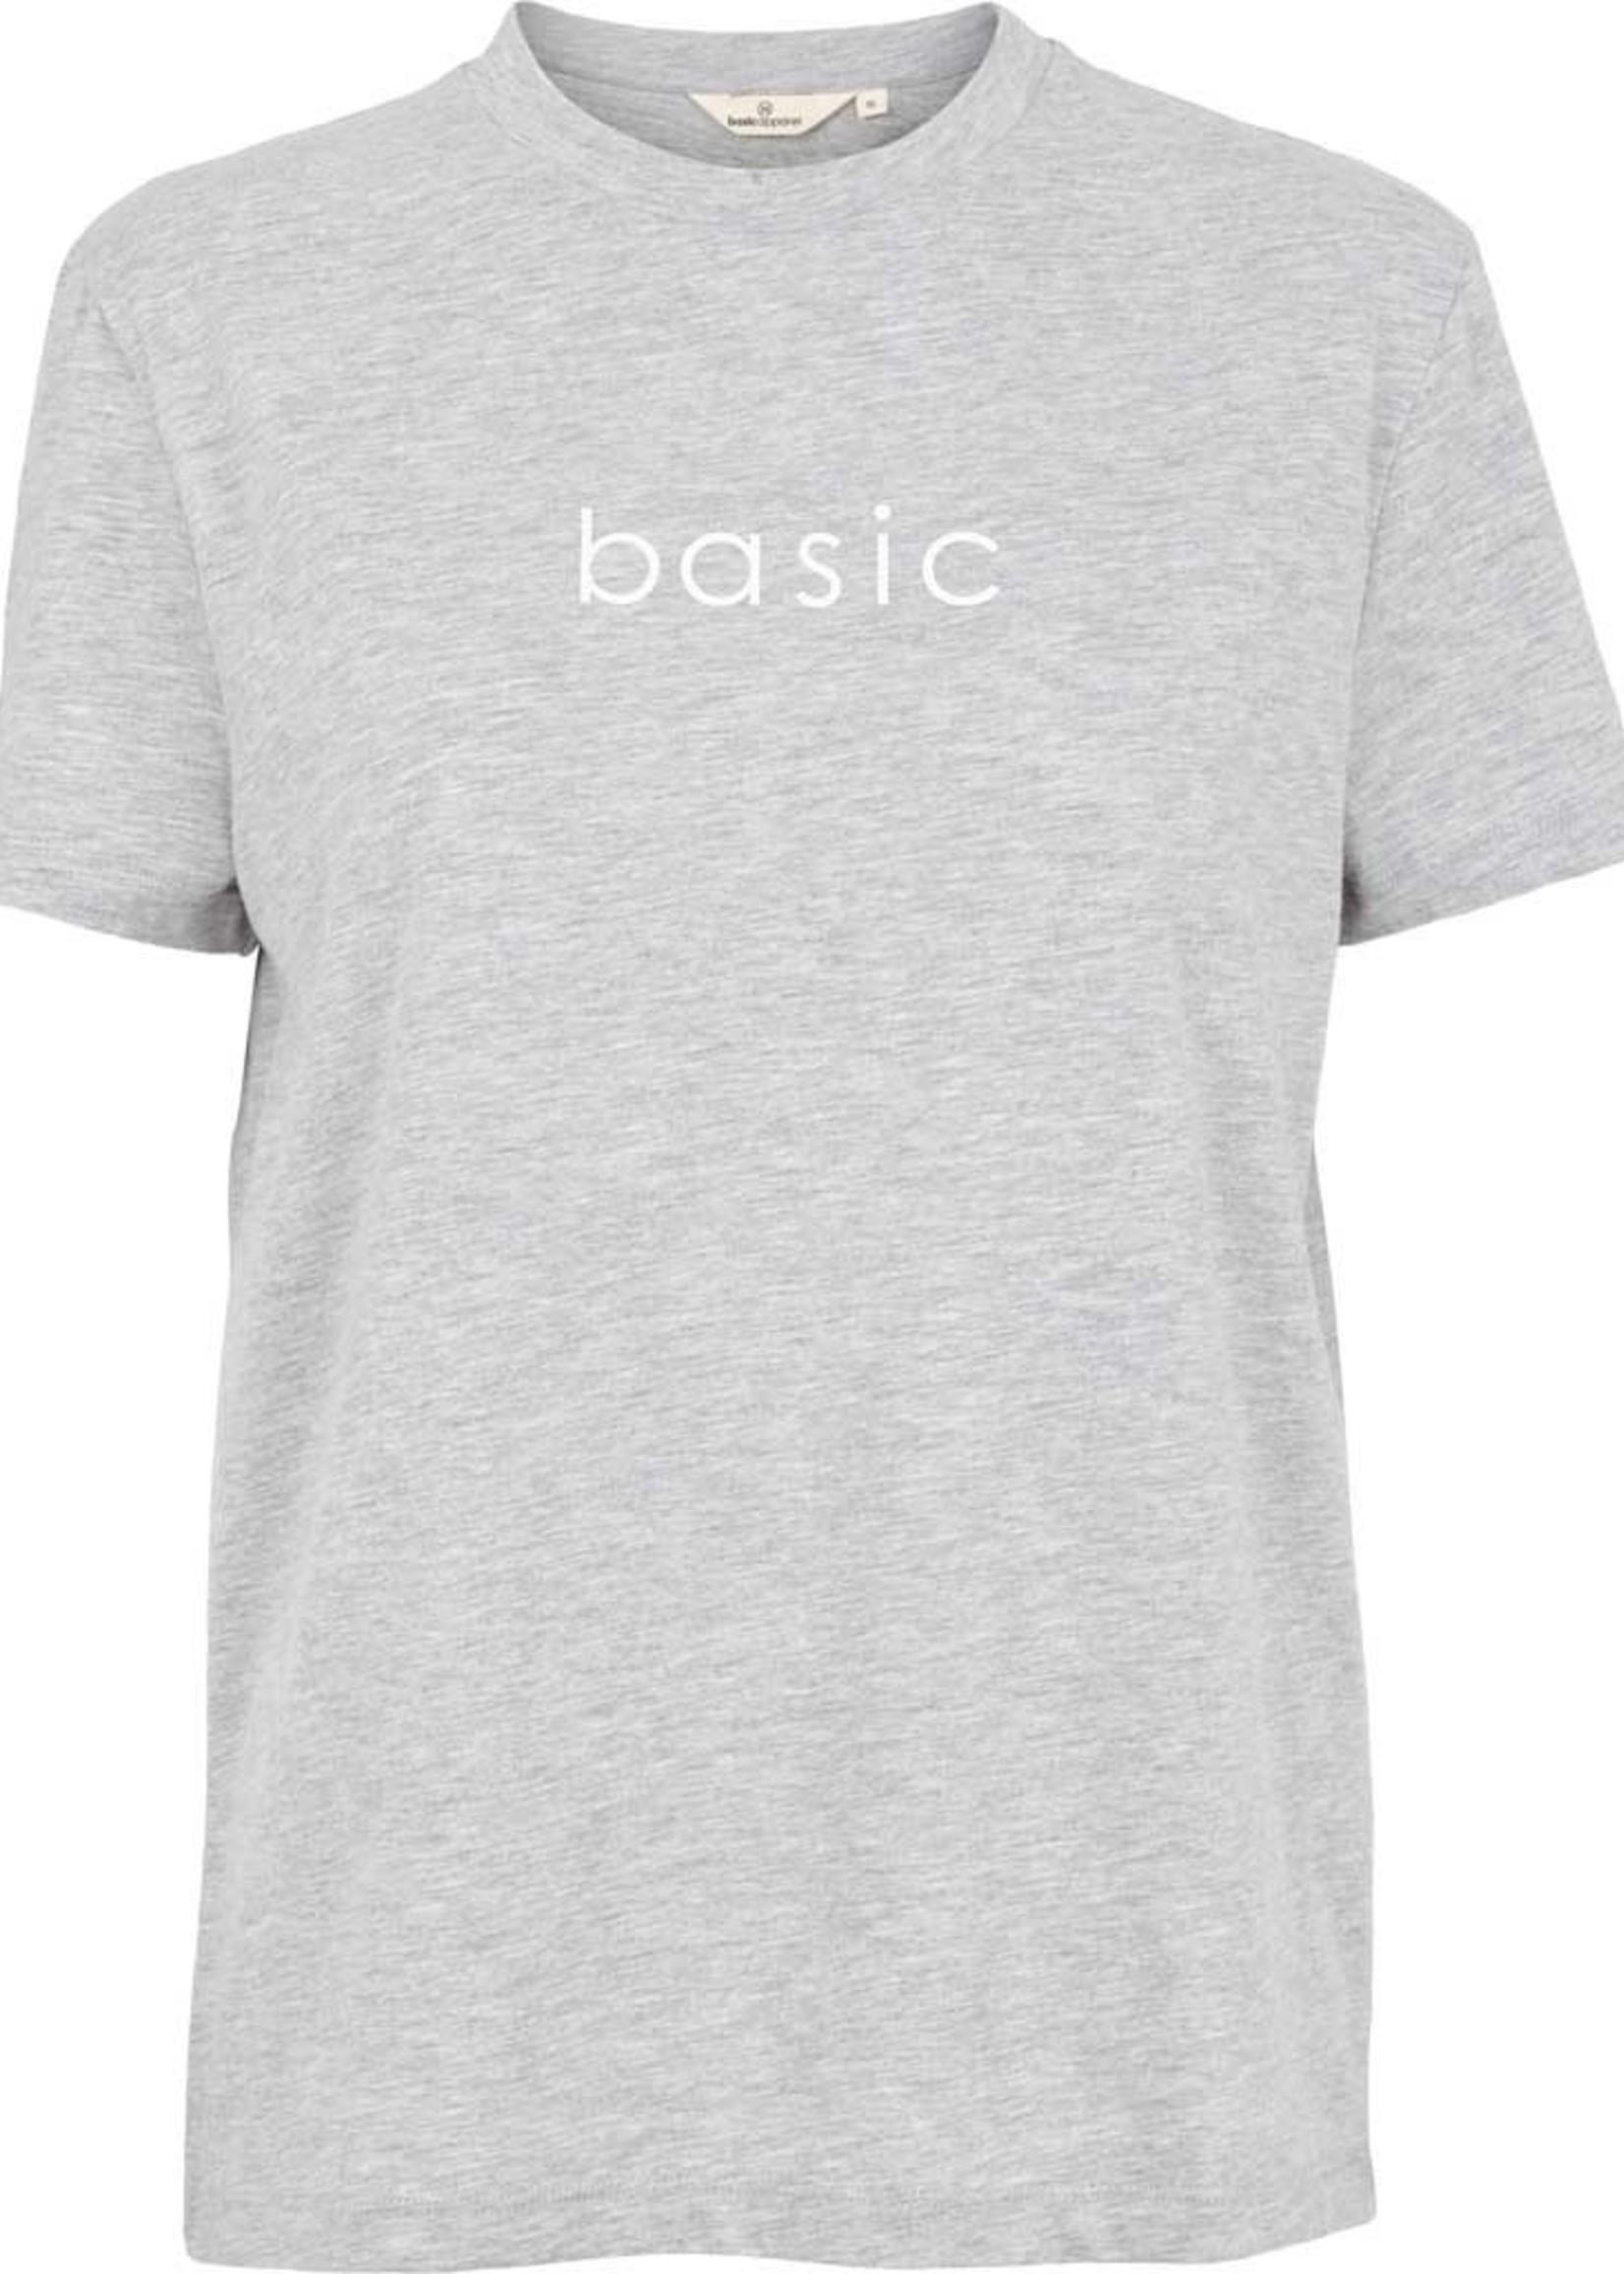 Basic Apparel Rikke Tee BASIC